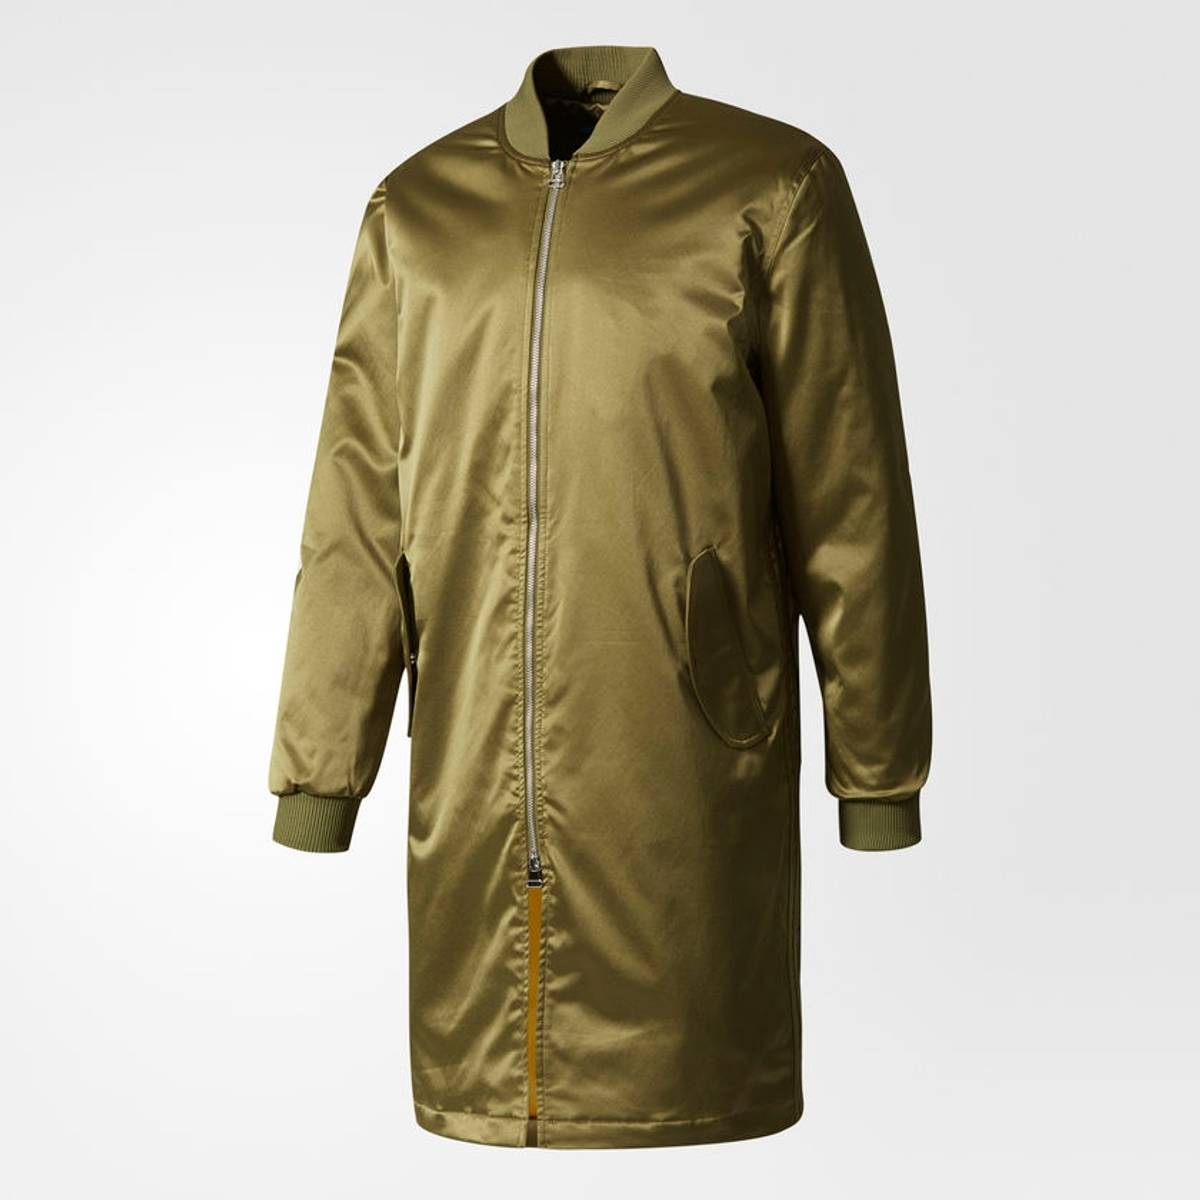 Adidas Originals SST HZO Men's Bomber Jacket BQ5245 Olive